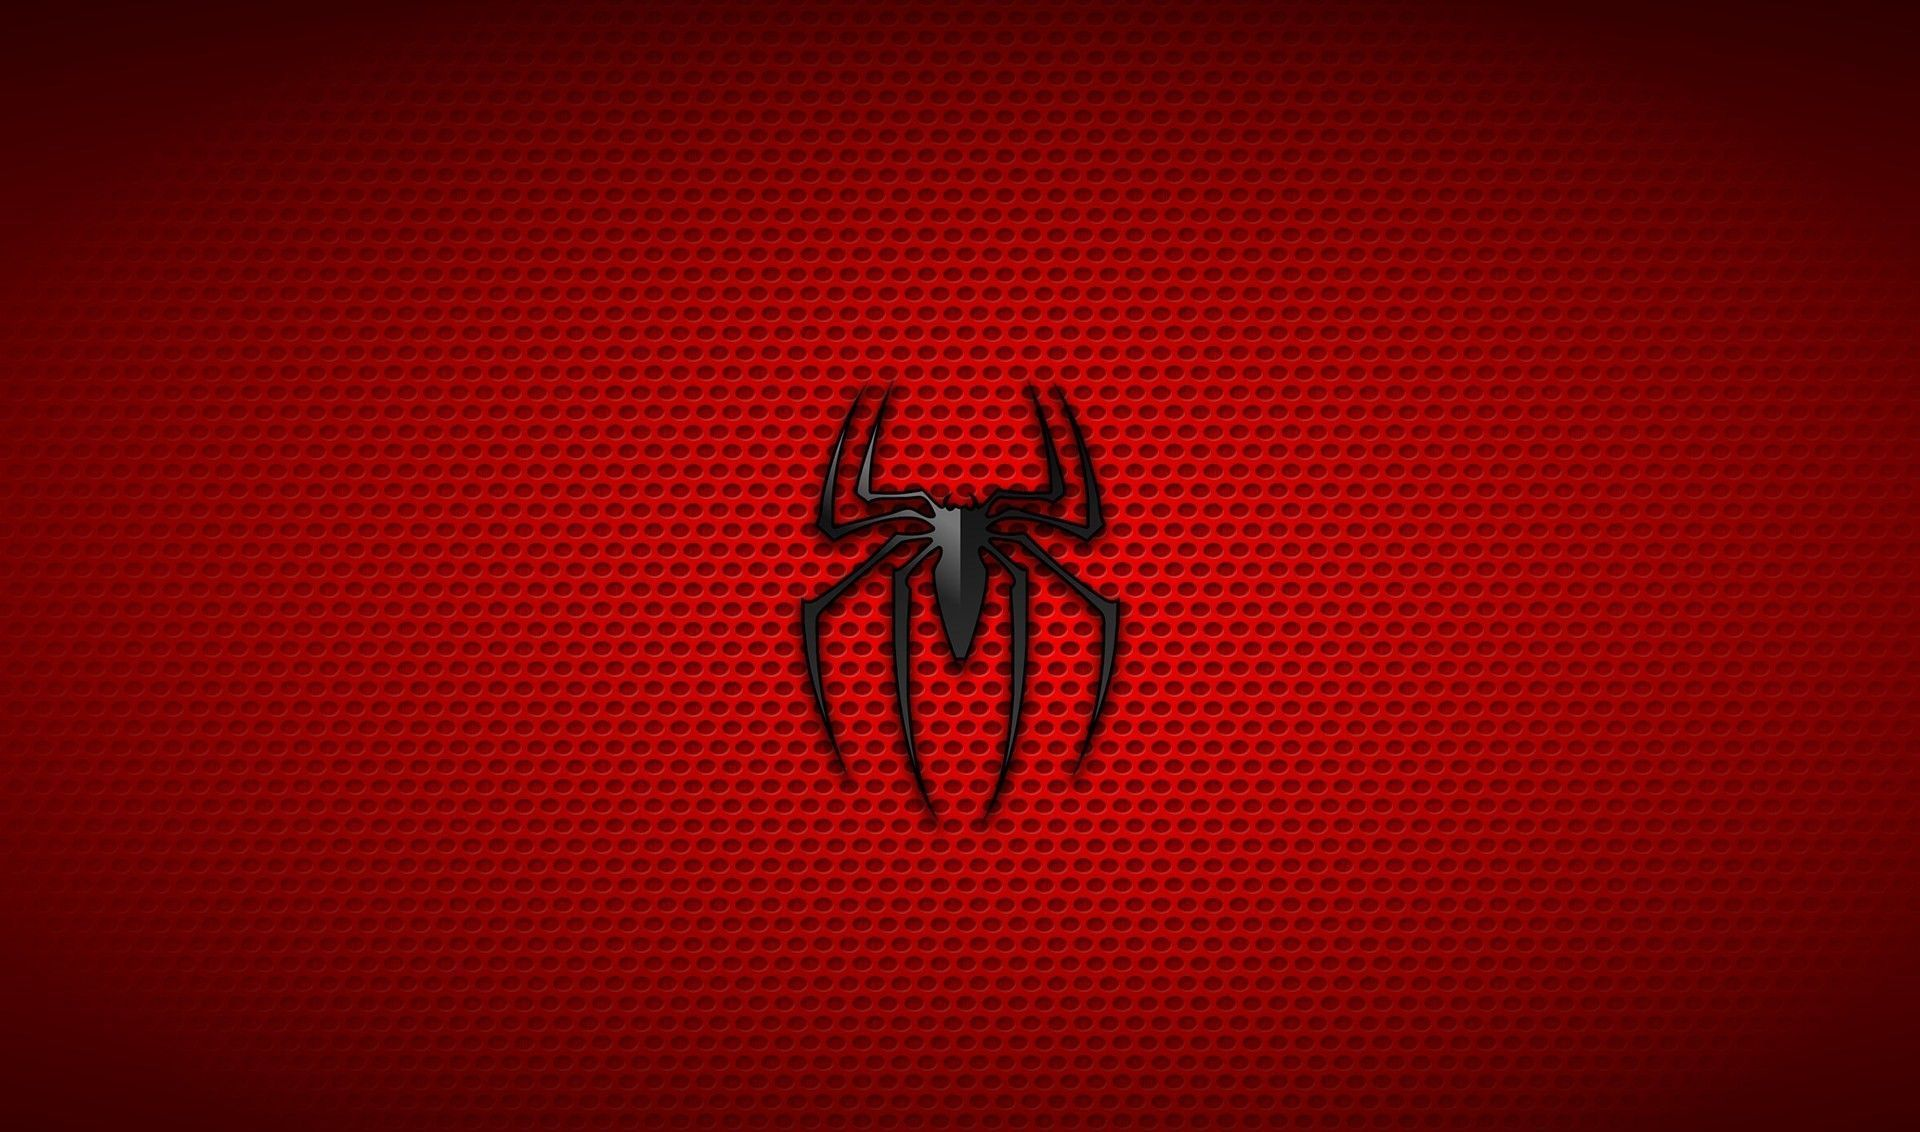 spiderman wallpapers | comic book superhero's & villain'setc